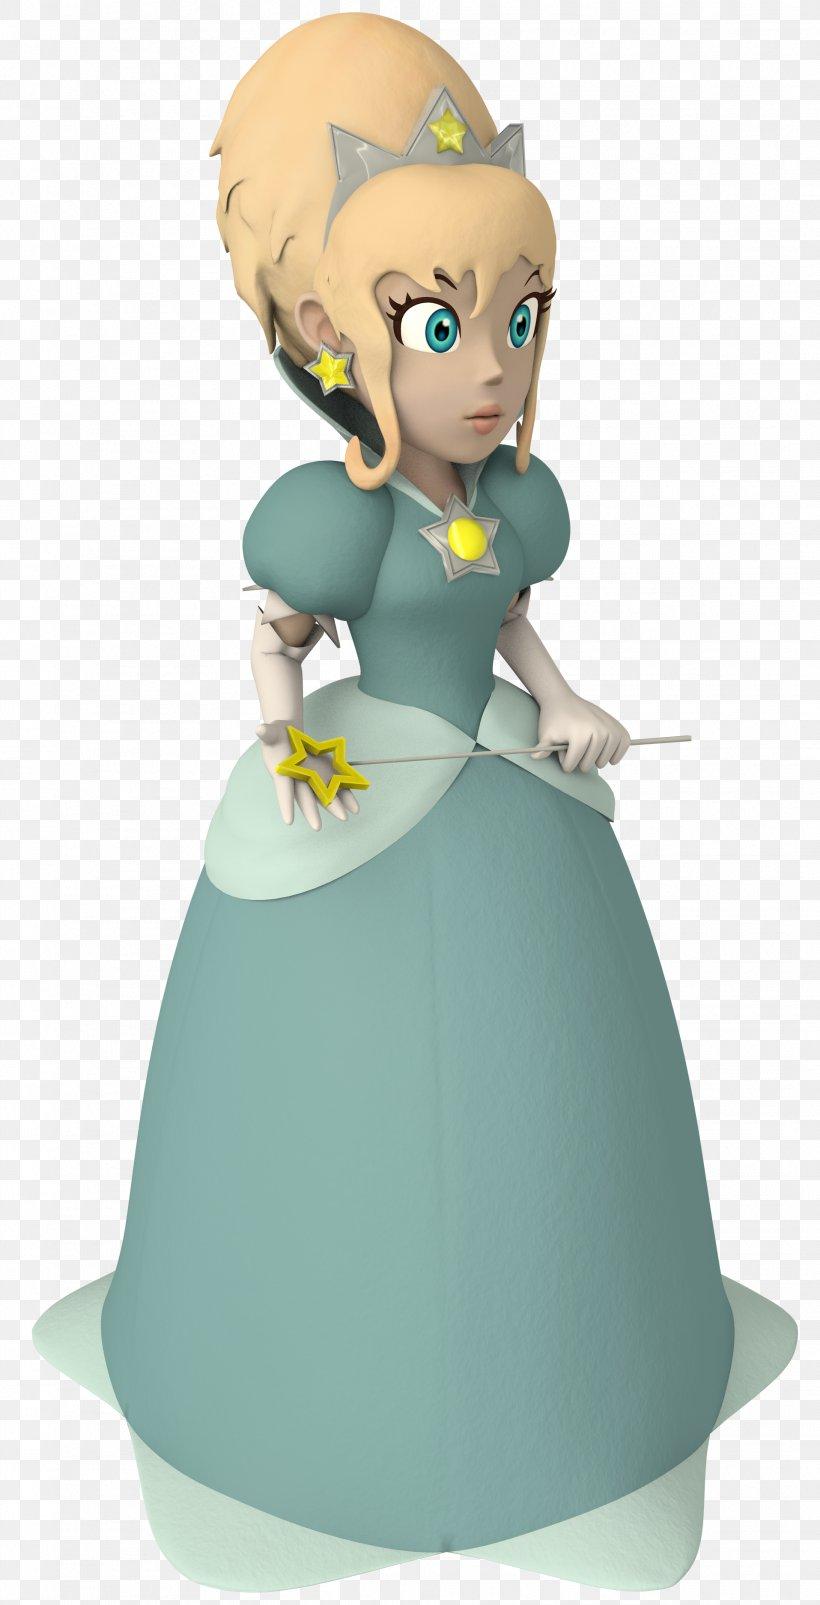 Rosalina Super Mario Galaxy Princess Peach Wii, PNG, 1915x3750px, Rosalina, Cartoon, Donkey Kong, Fictional Character, Figurine Download Free